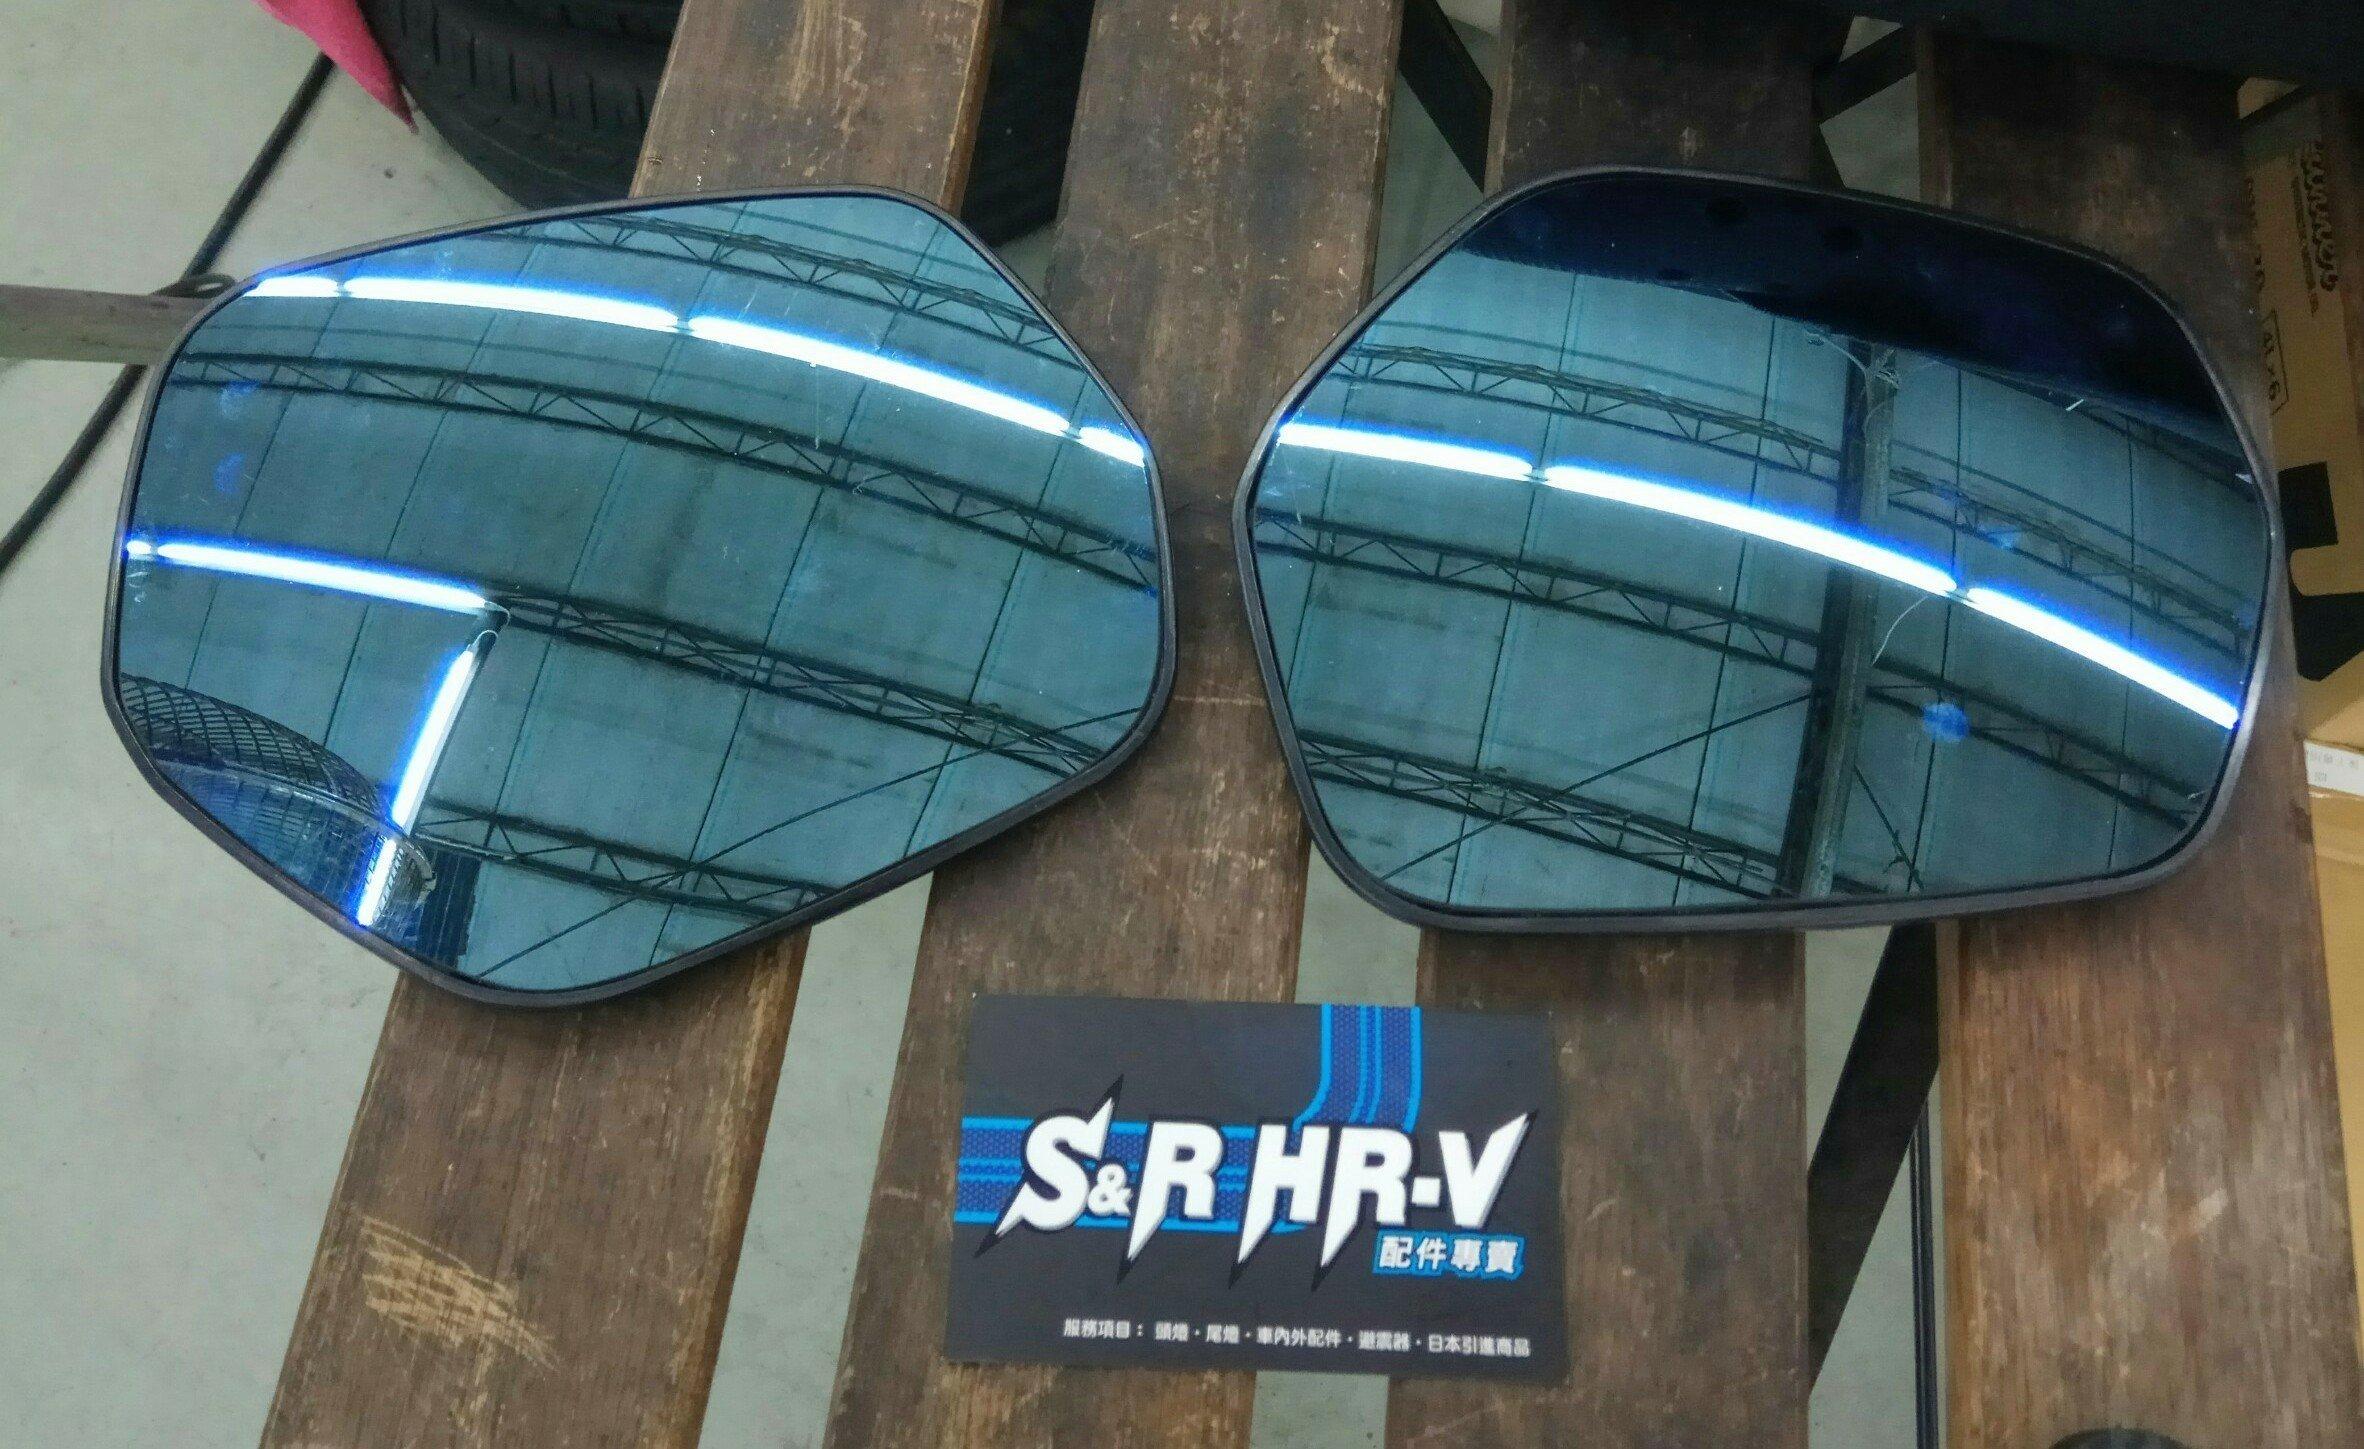 Honda HRV 廣角光學 替換式藍鏡 防眩光後視藍鏡 藍鏡 hrv HRV HR-V